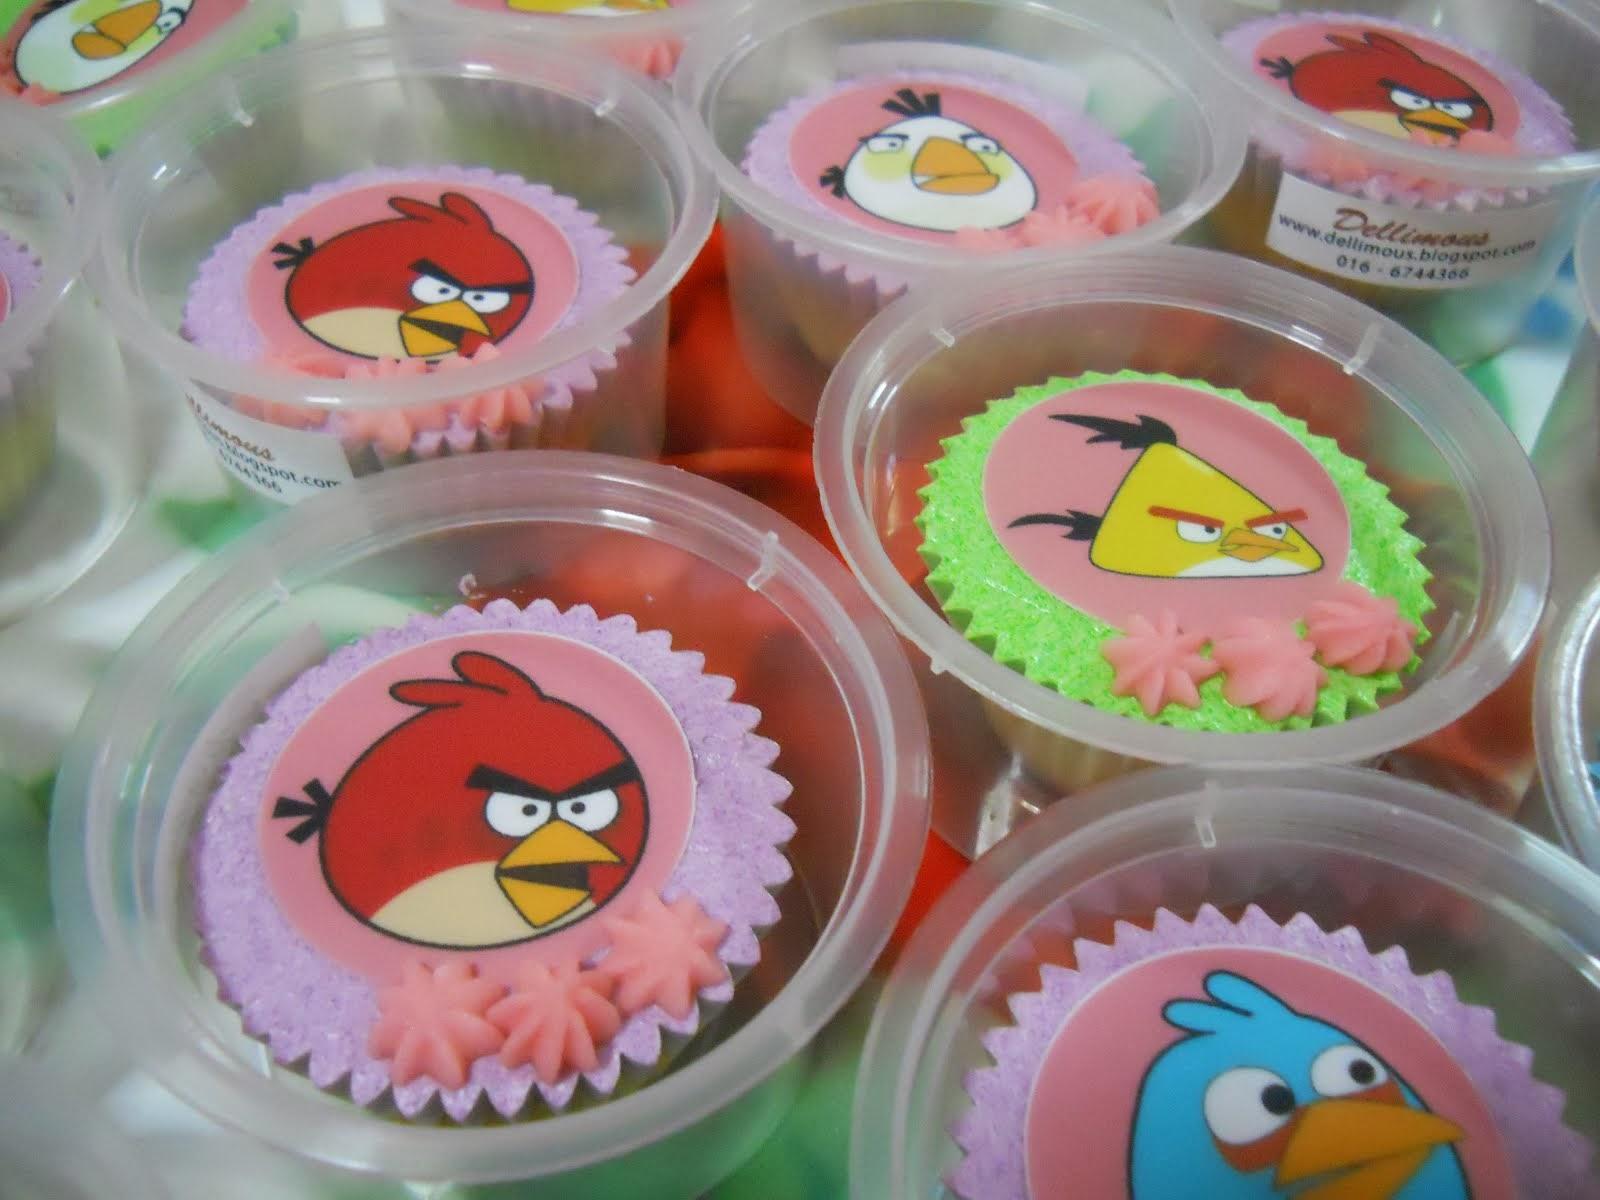 Cupcake + icing + edible Image (readymade) + reben = RM2.50